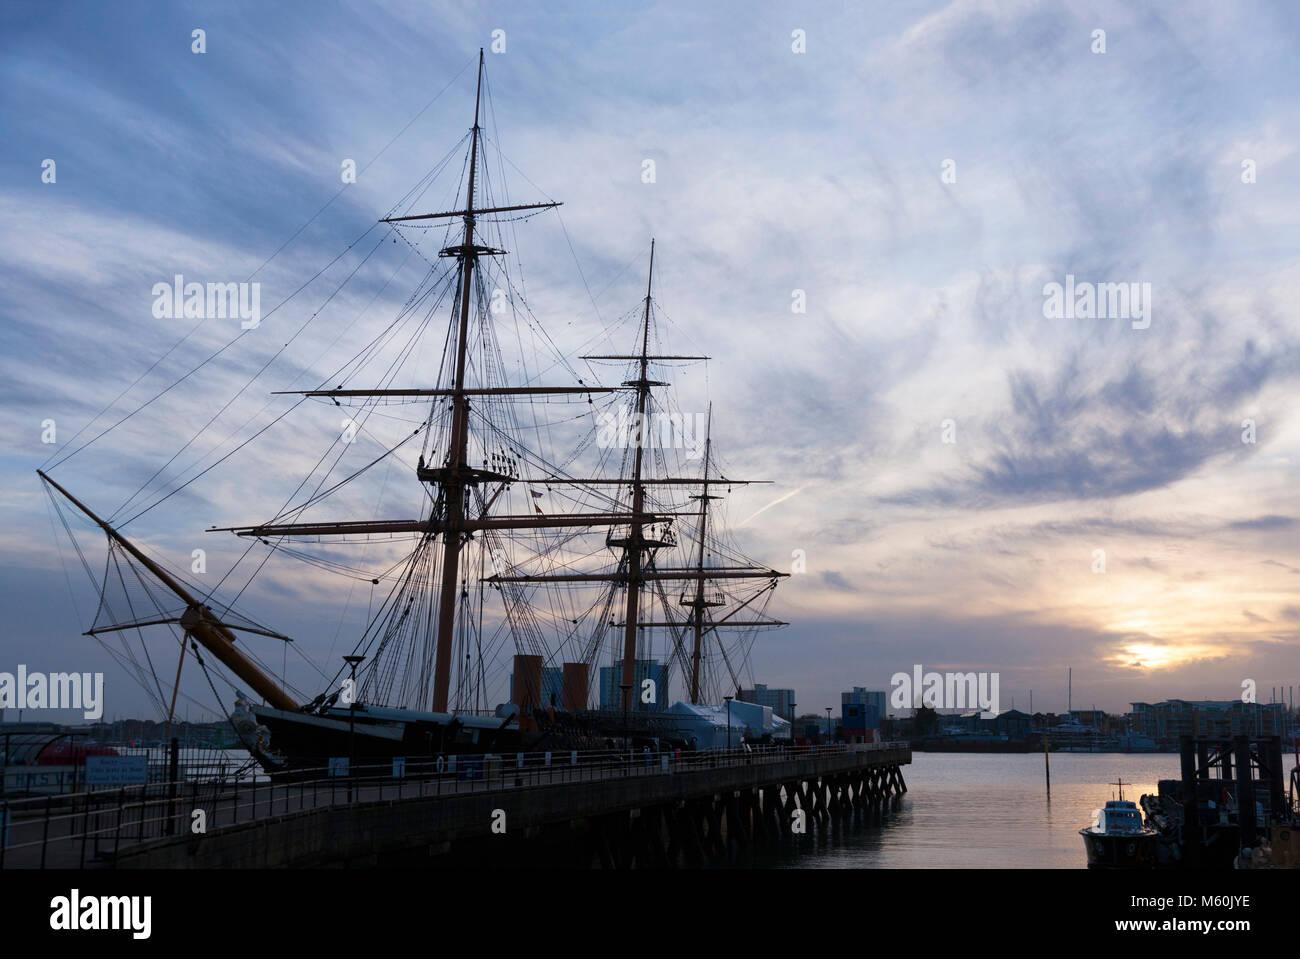 HMS Warrior, at sunset in winter. Portsmouth Historic Dockyard / Historical Dockyards. UK. (95) - Stock Image